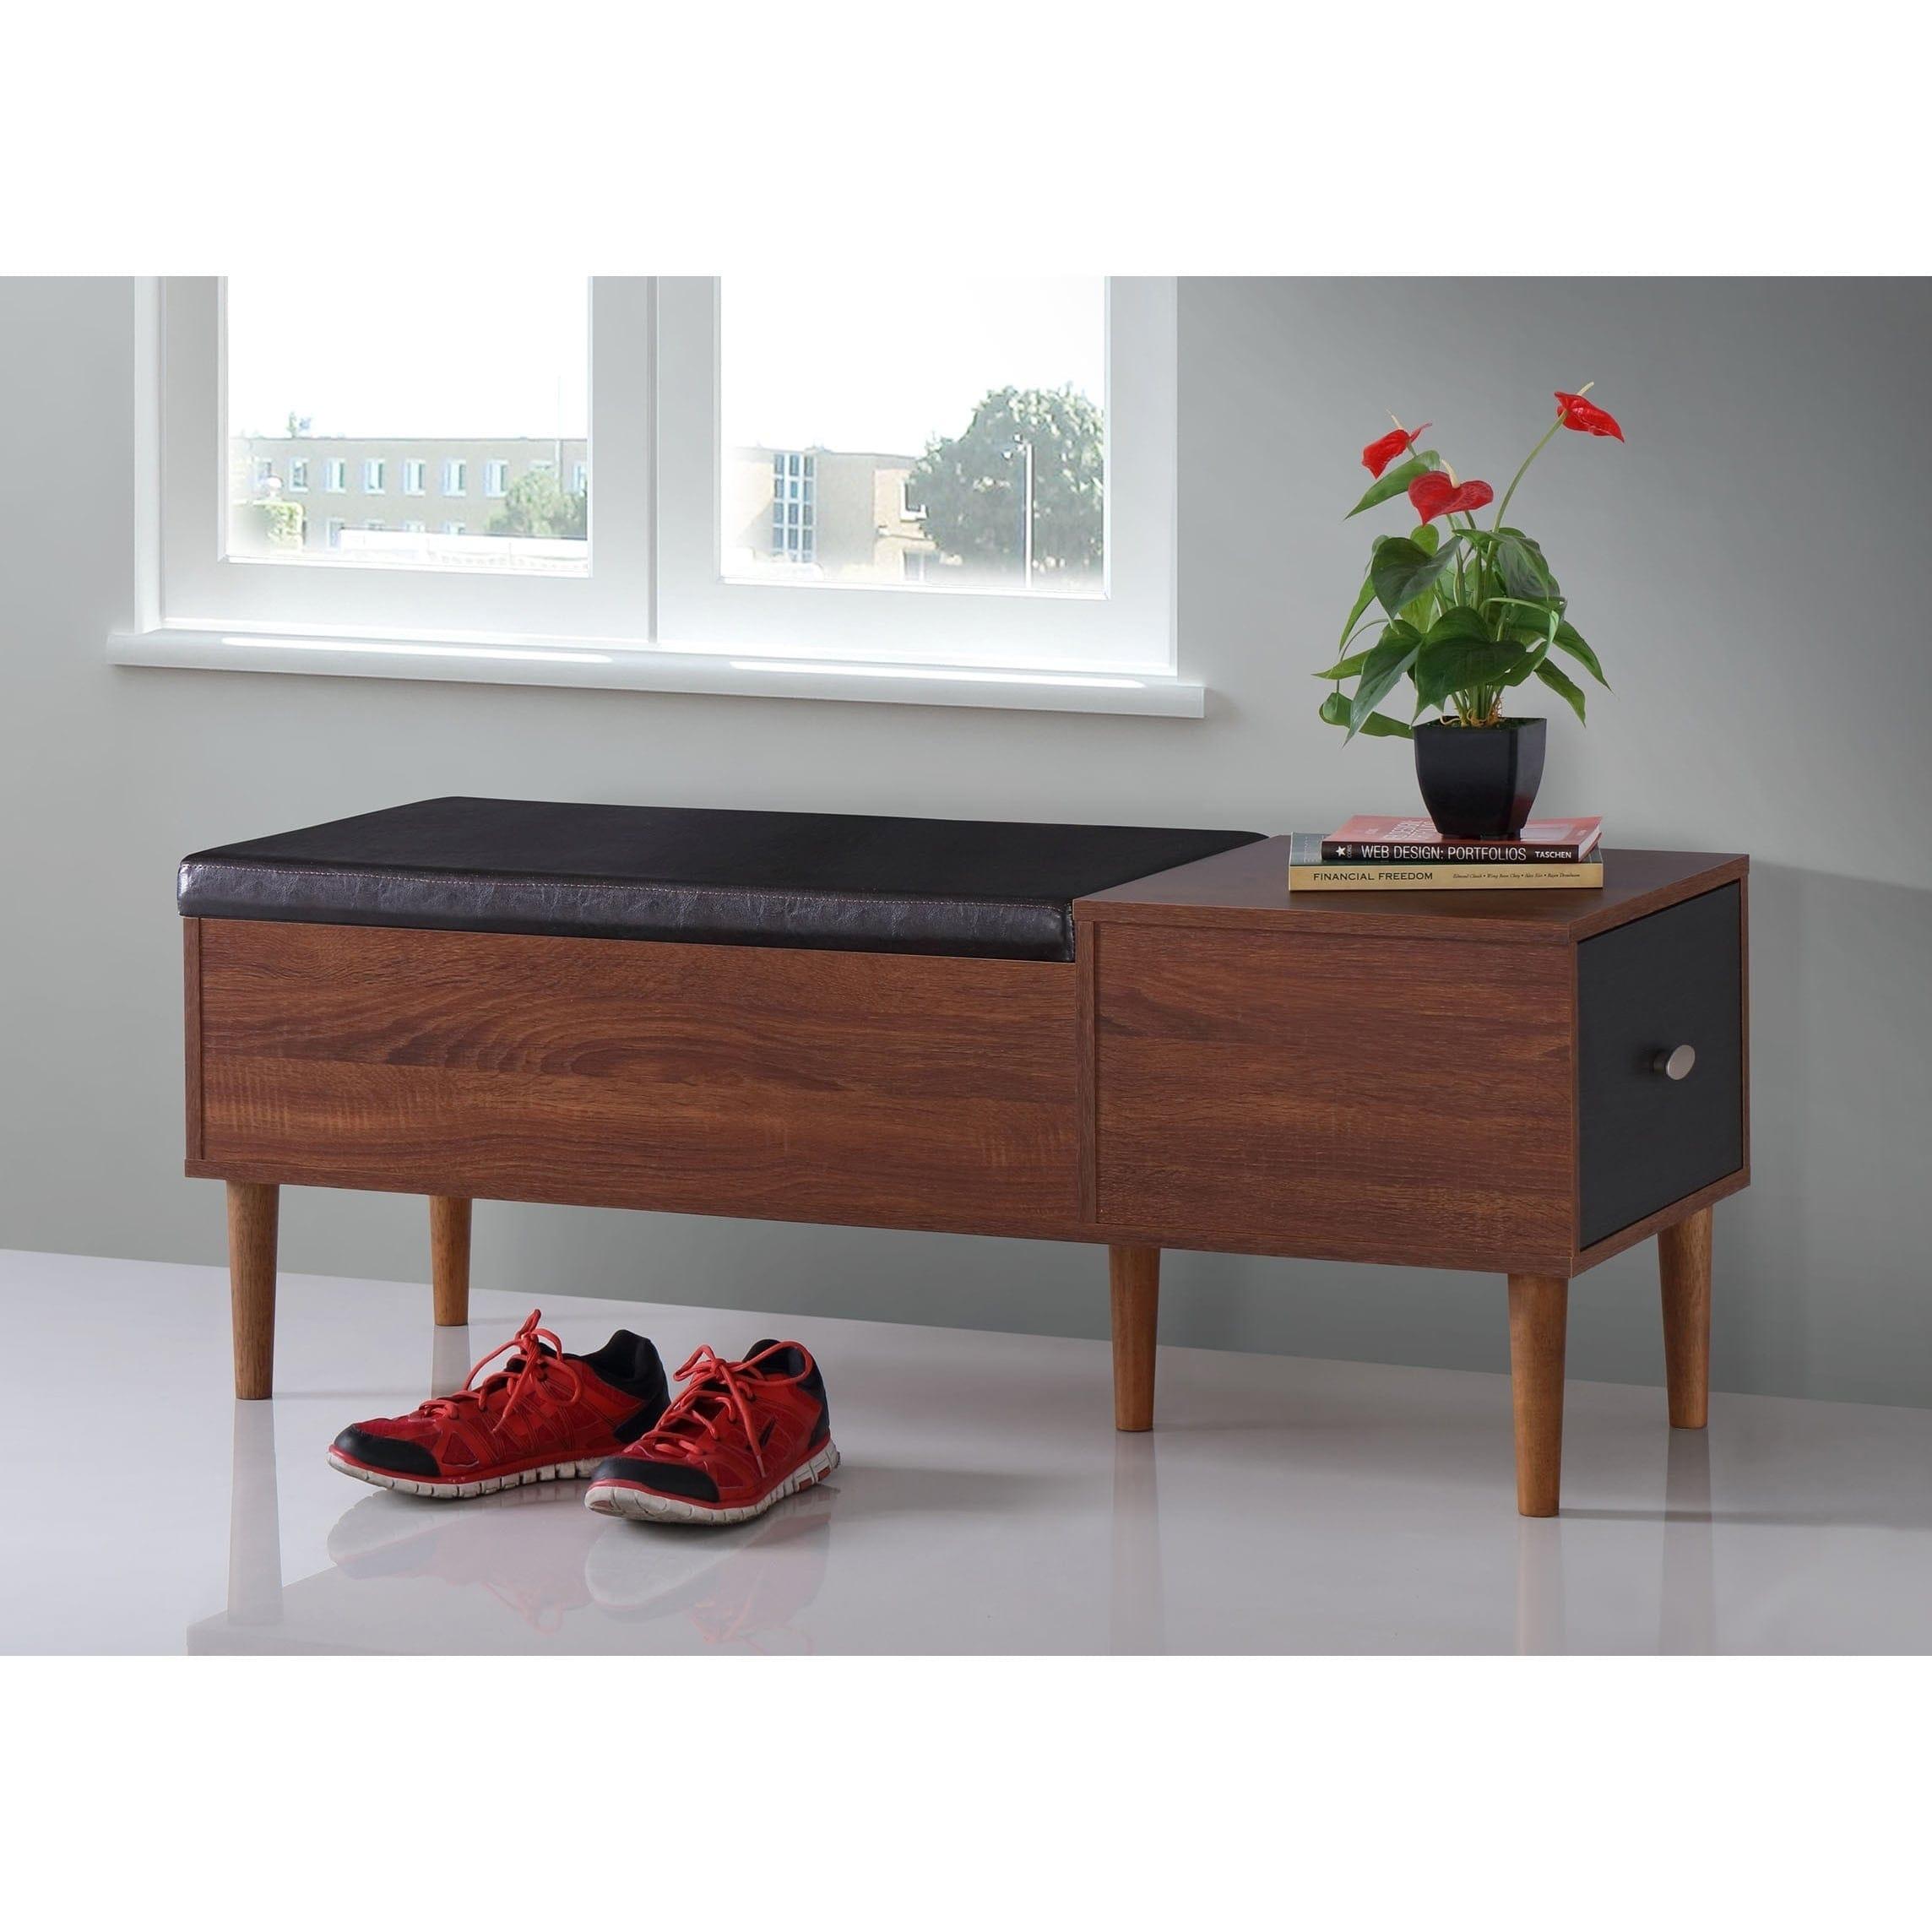 Excellent Details About Mid Century 1 Drawer Shoe Storage Bench By Baxton Studio Inzonedesignstudio Interior Chair Design Inzonedesignstudiocom